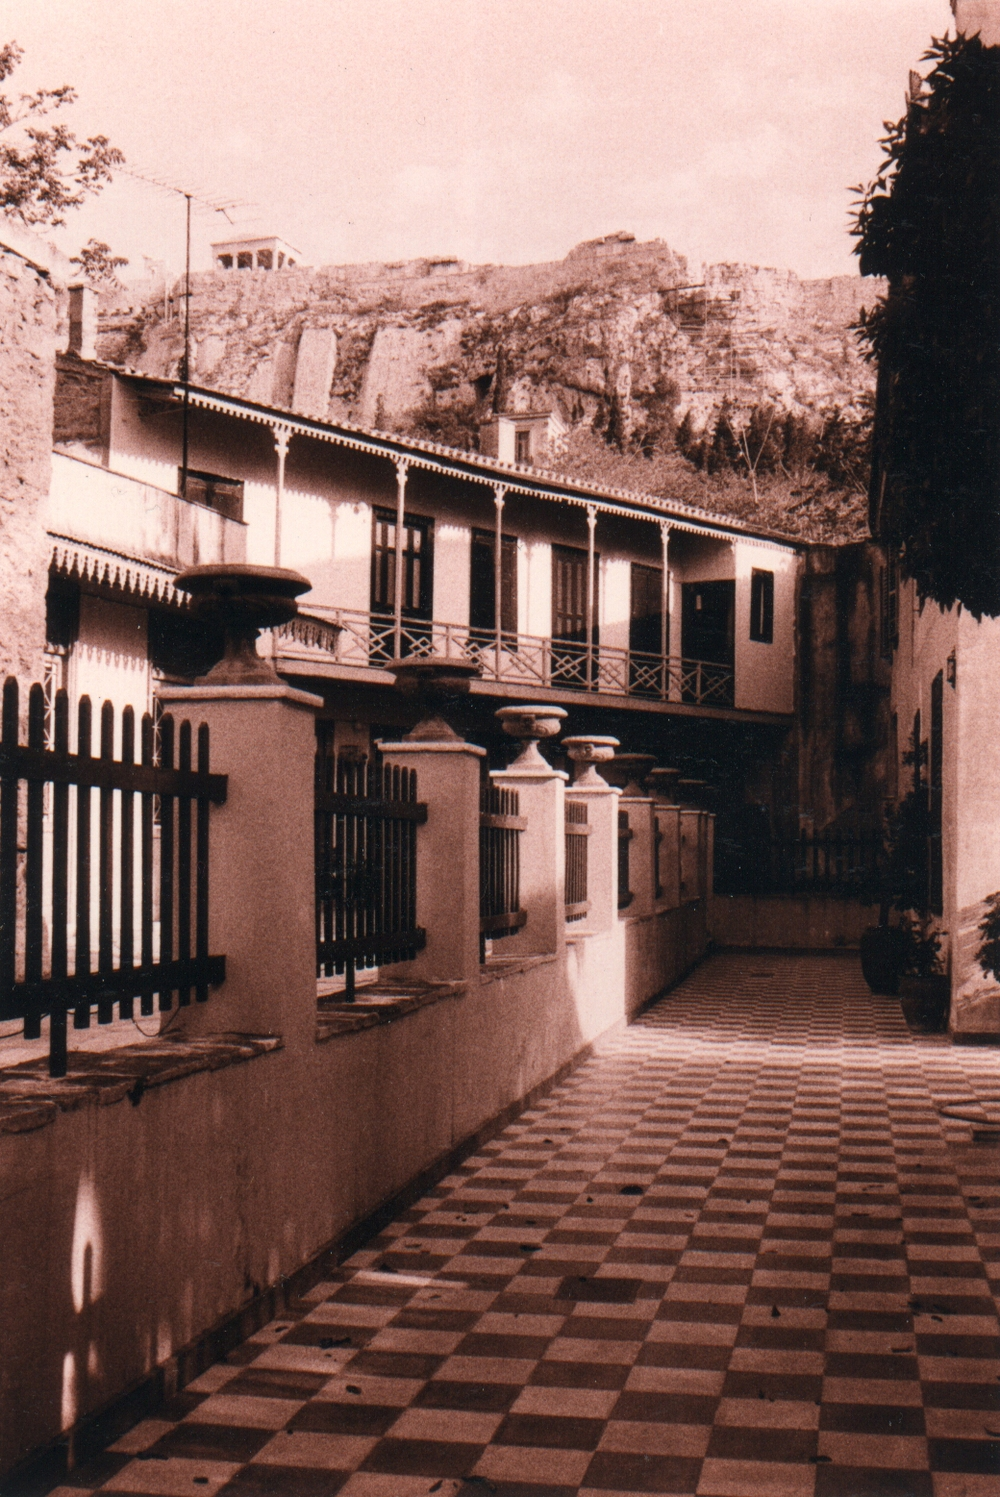 Old City, Acropolis, Greece VHS 1988